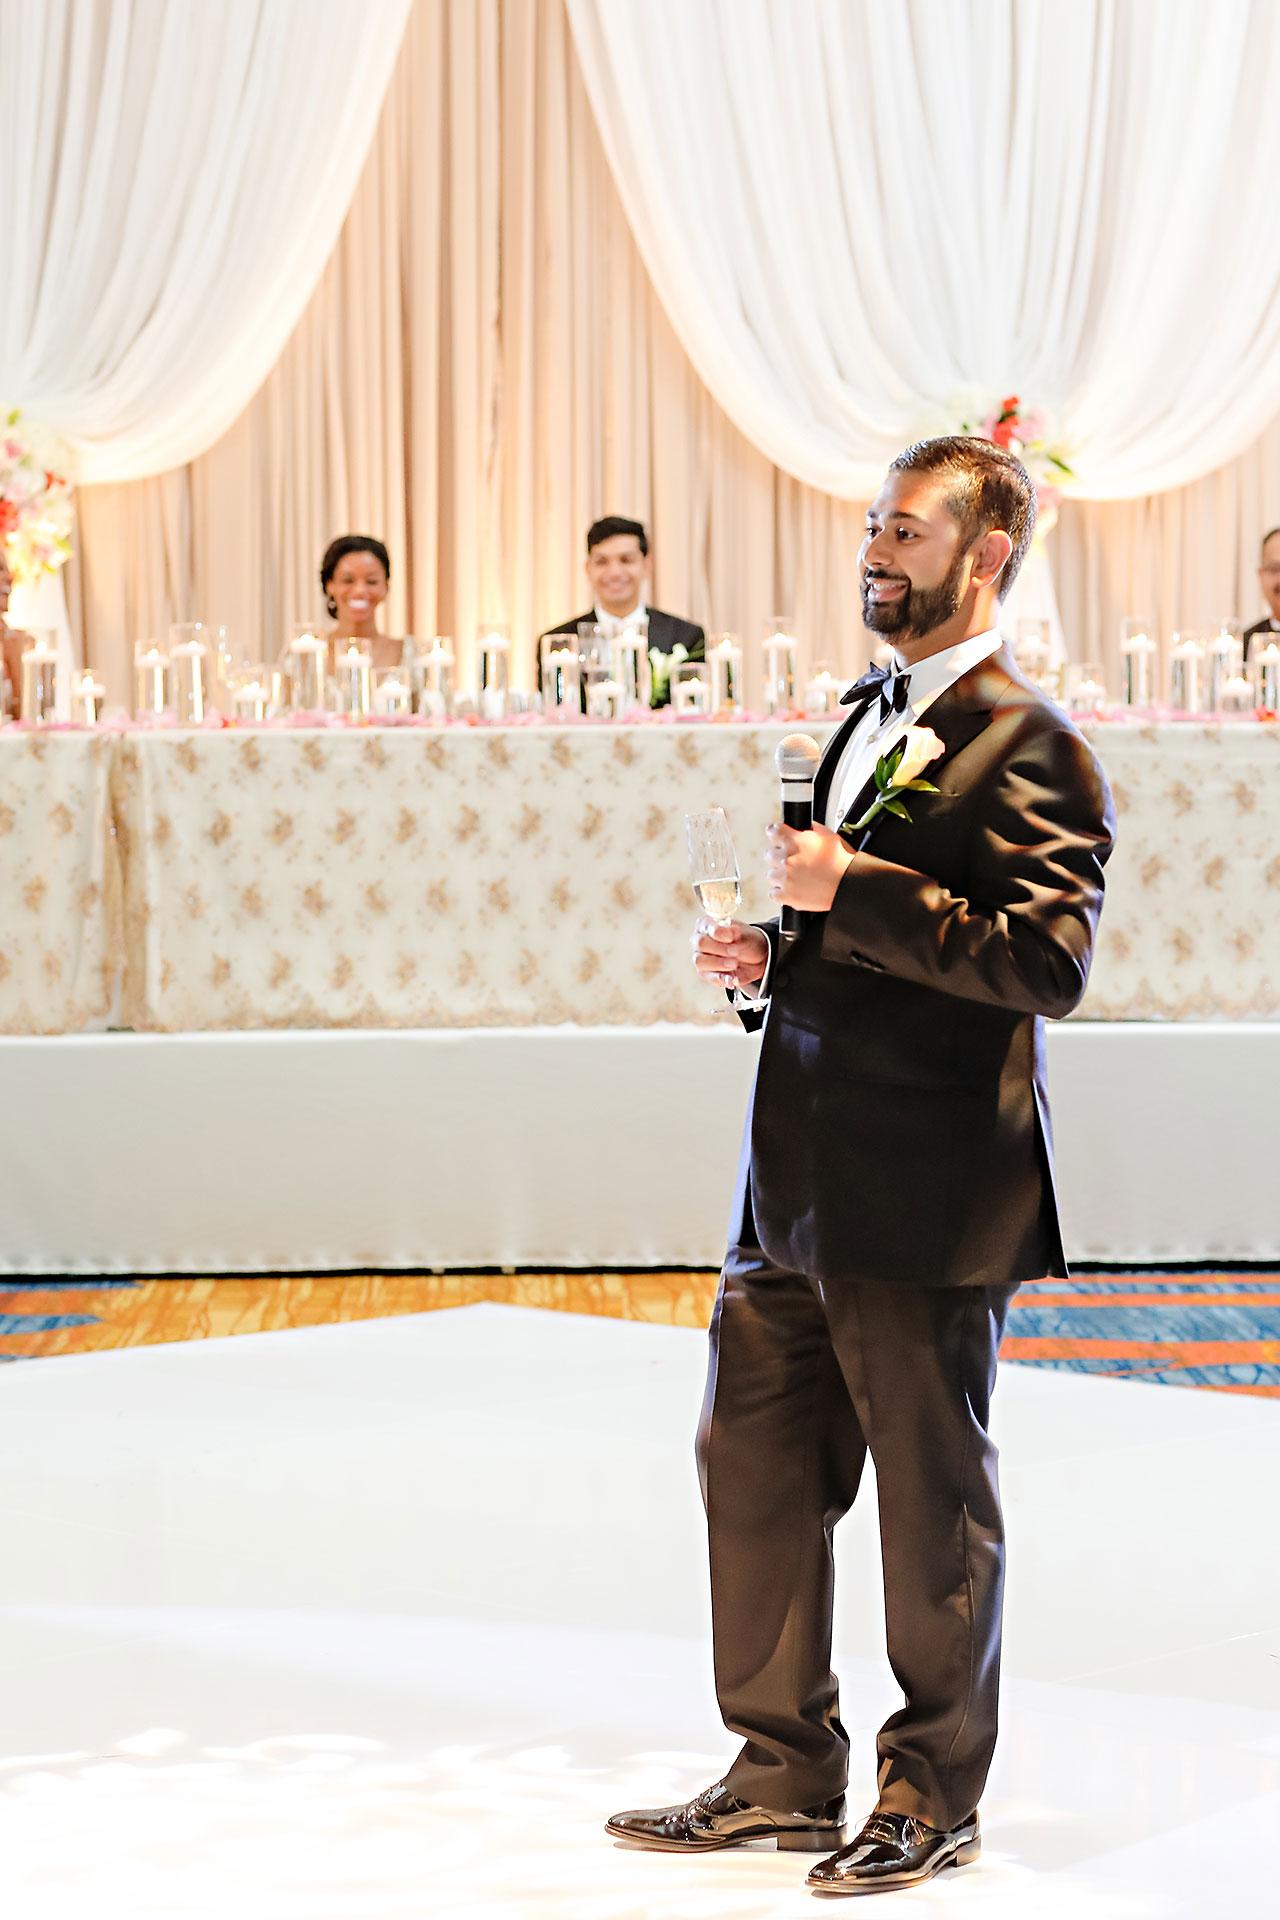 Joie Nikhil JW Marriott Indianapolis Wedding 101